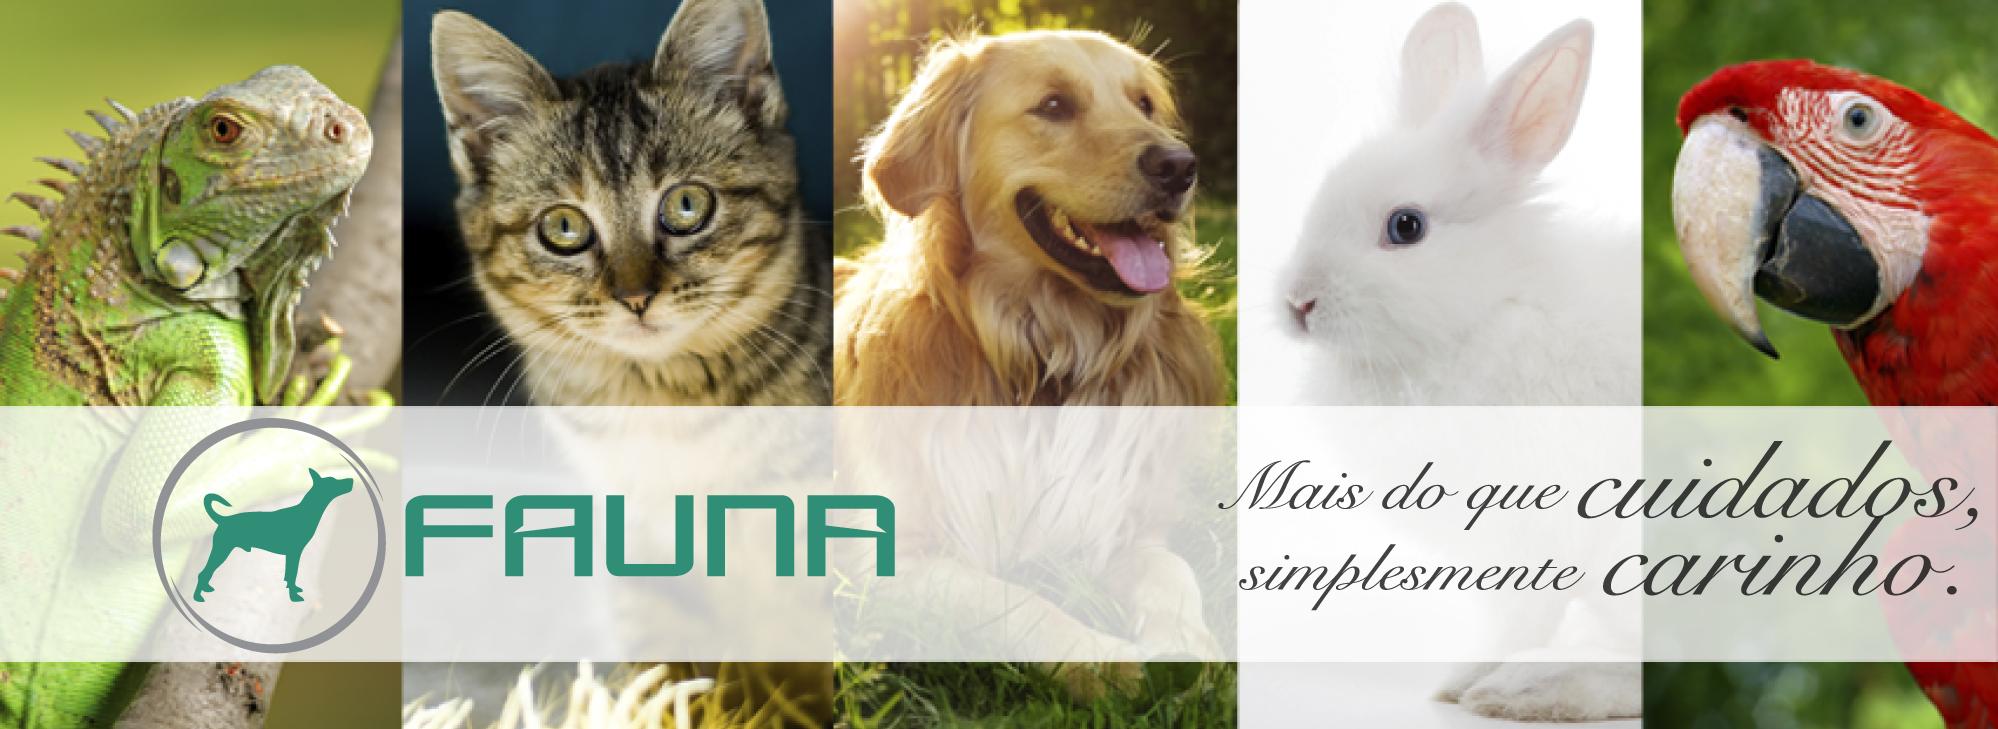 Banner_site-Fauna